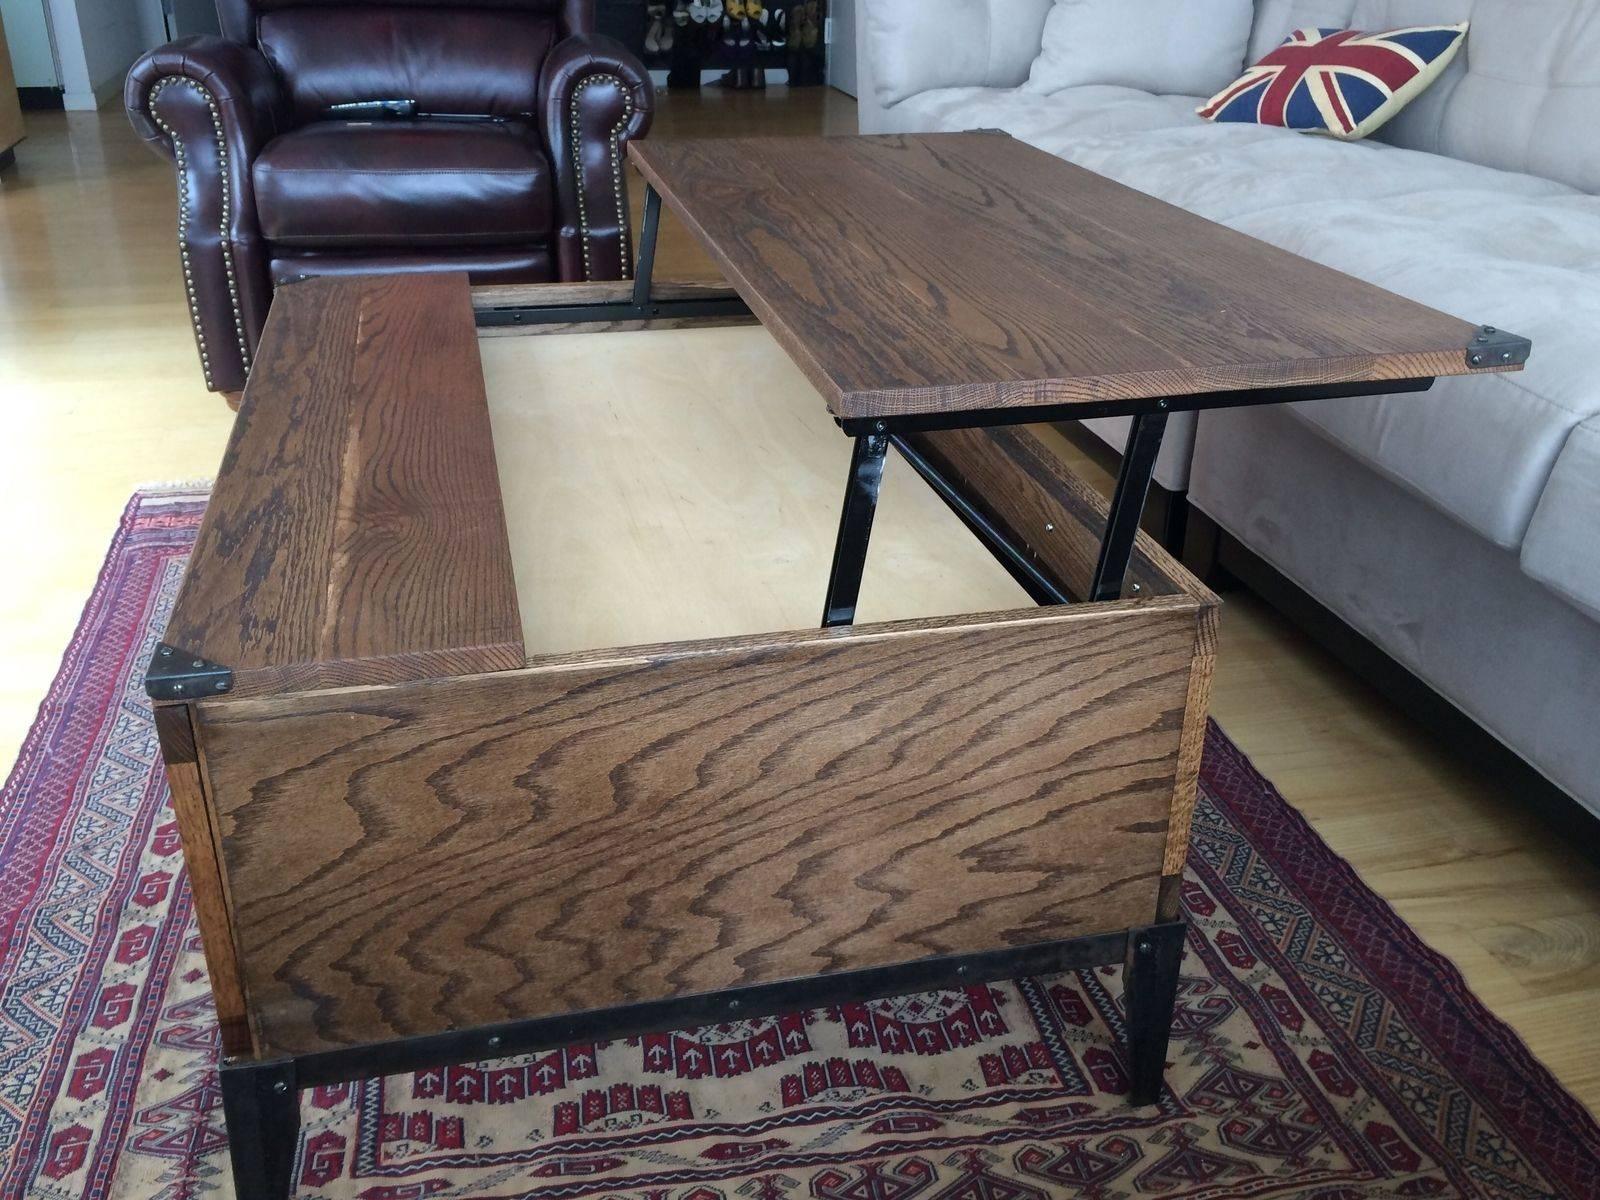 Custom Coffee Tables | Handmade Wood Coffee Tables | Custommade with Coffee Tables Extendable Top (Image 8 of 30)